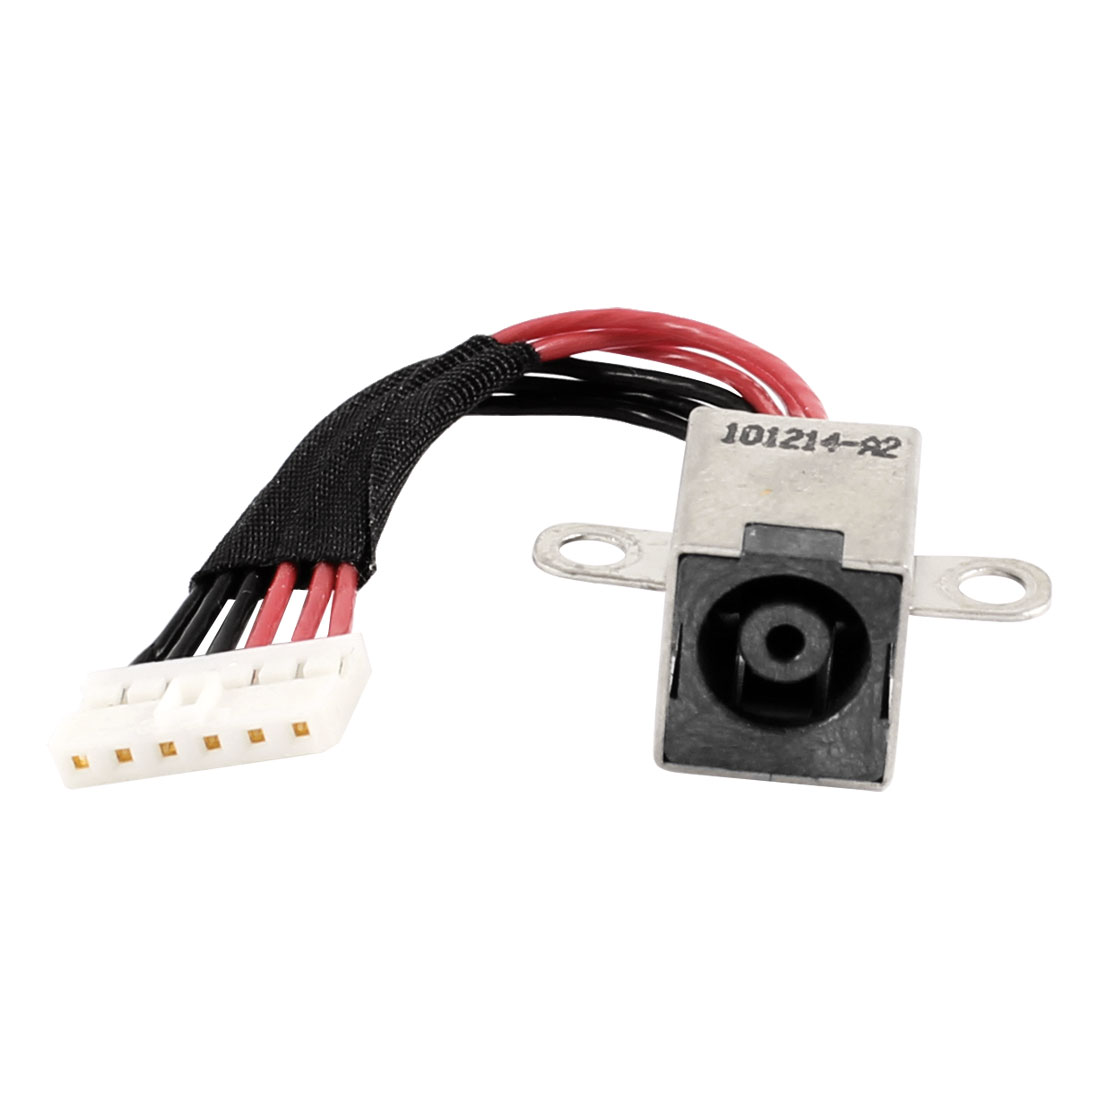 PJ364 DC Power Jack Connector Harness Scoket for Pavilion DV7 Series